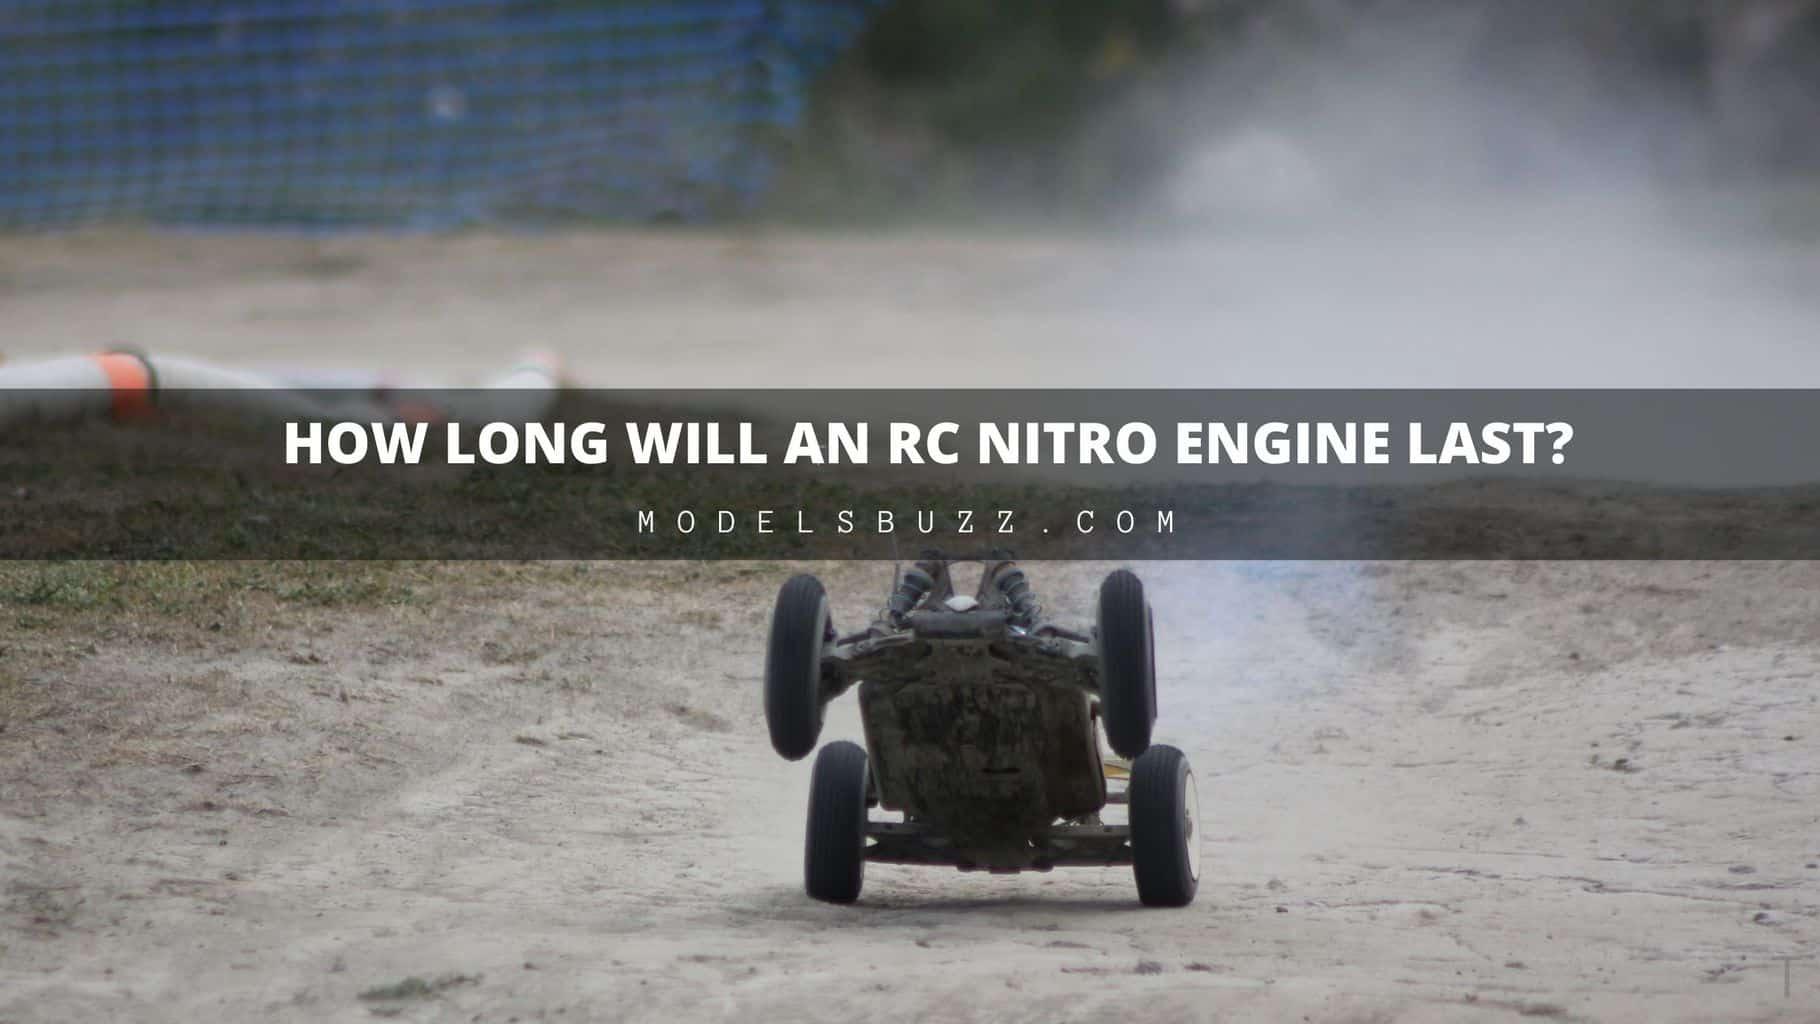 How Long Will an RC Nitro Engine Last?